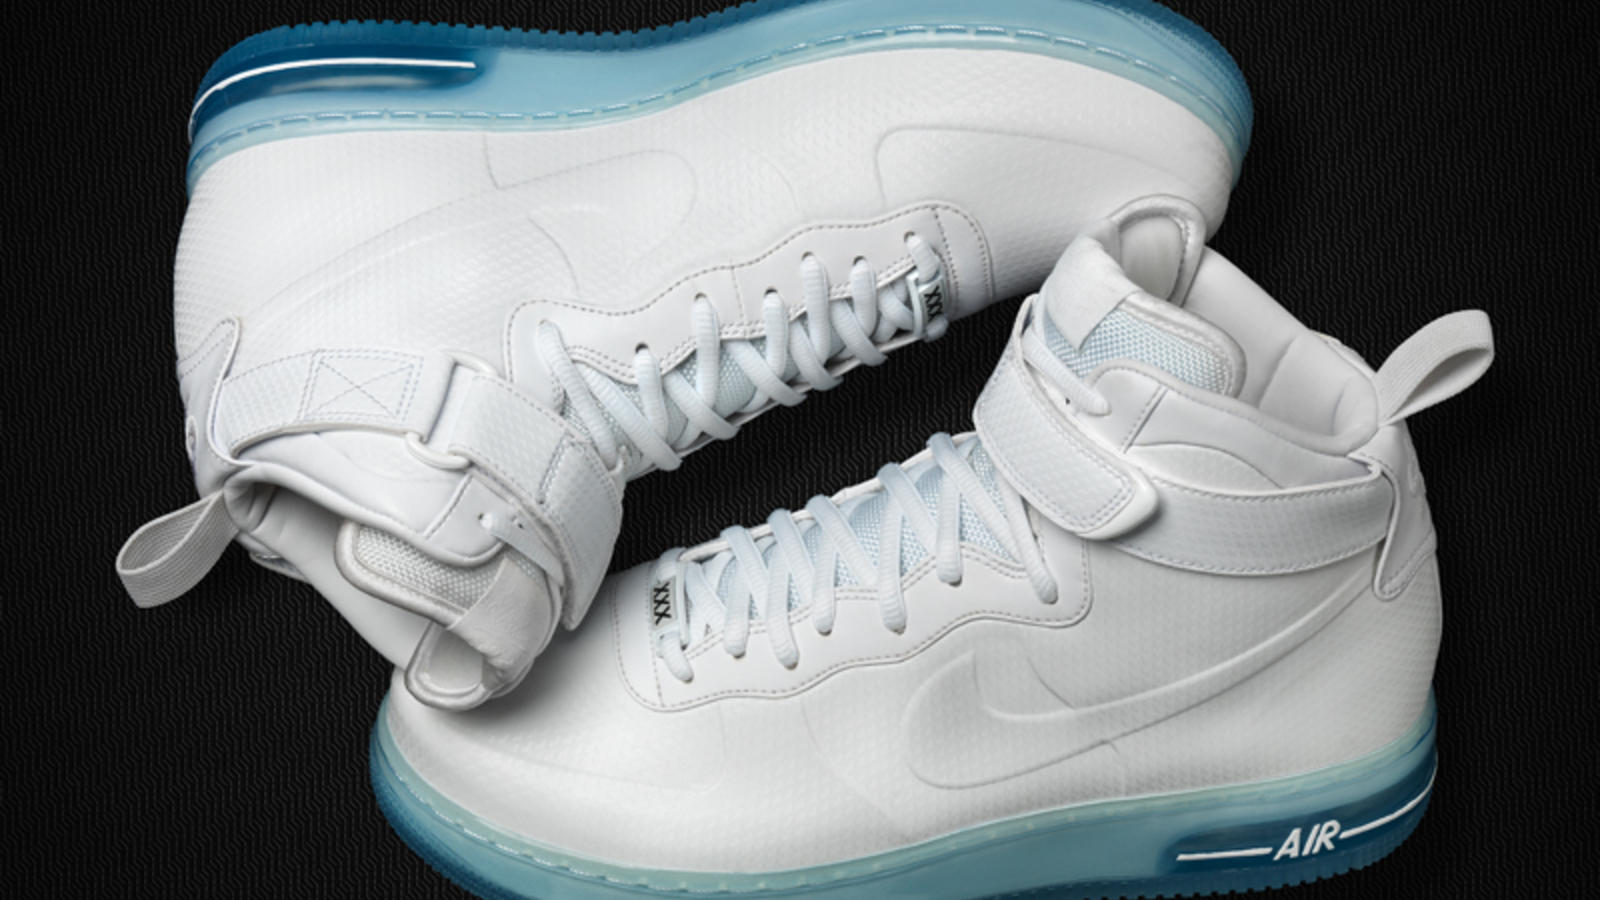 nike air force 1 black the foams sneakers